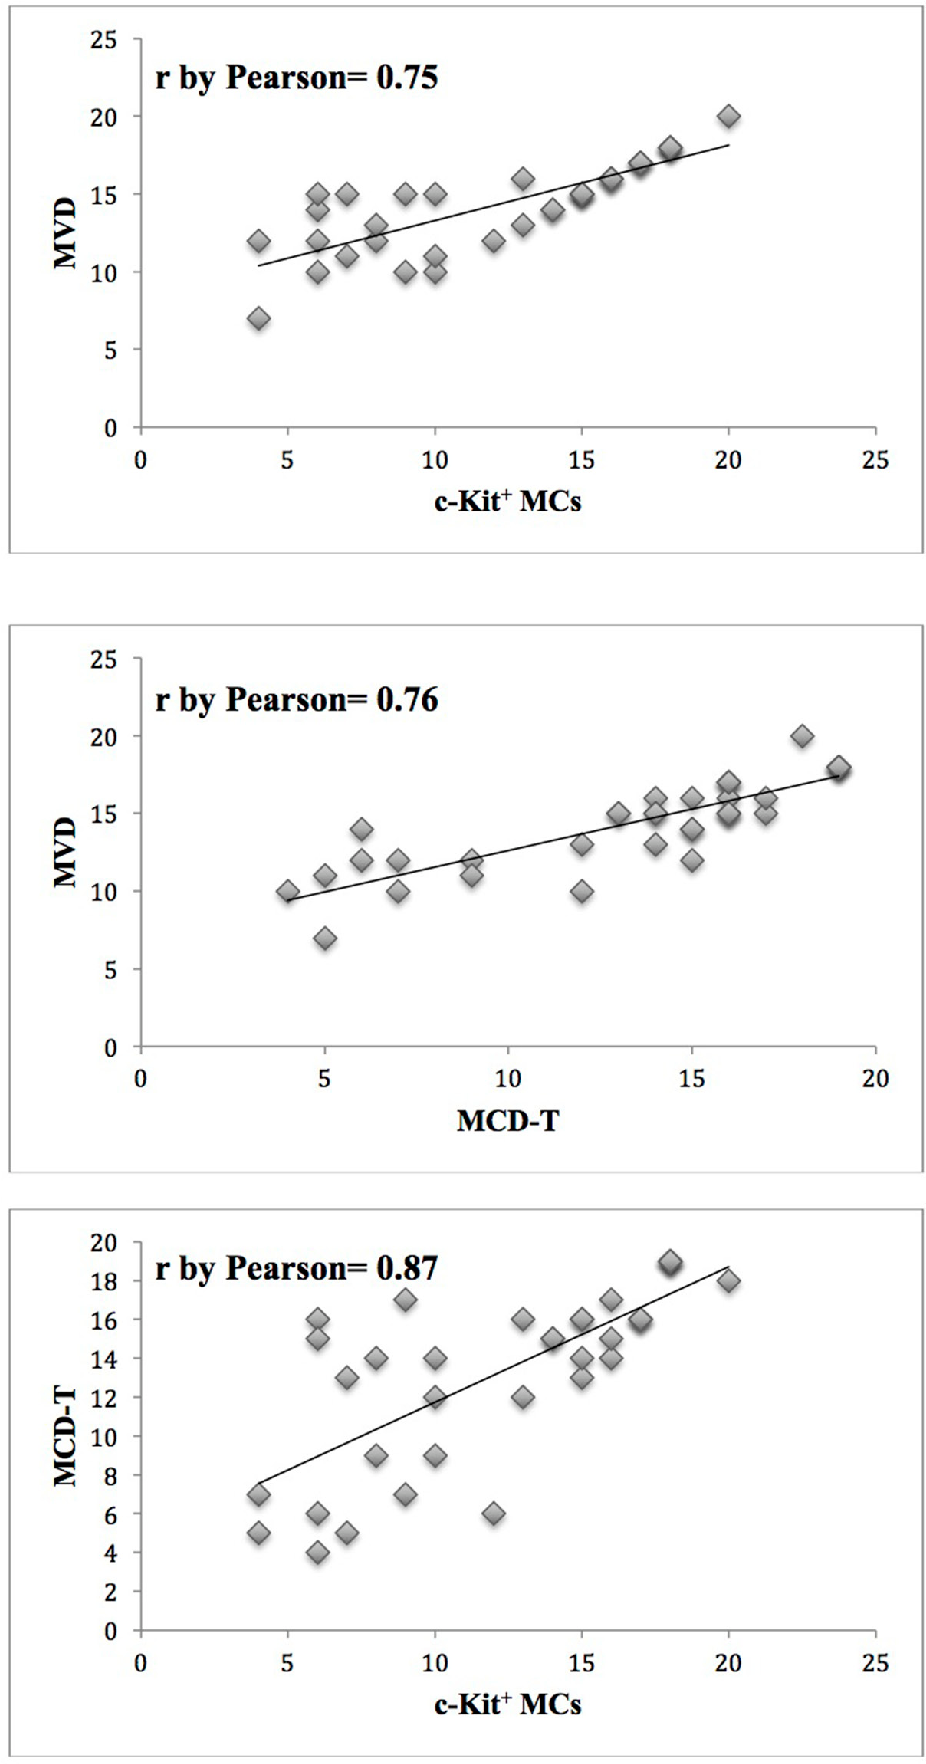 Figure 2: Correlation analysis between c-Kit+ MCs and MVD (r= 0.75, p= 0.04), MCD-T and MVD (r= 0.76, p= 0.03), between MCD-T and c-Kit+ MCs (r= 0.87 p= 0.01).